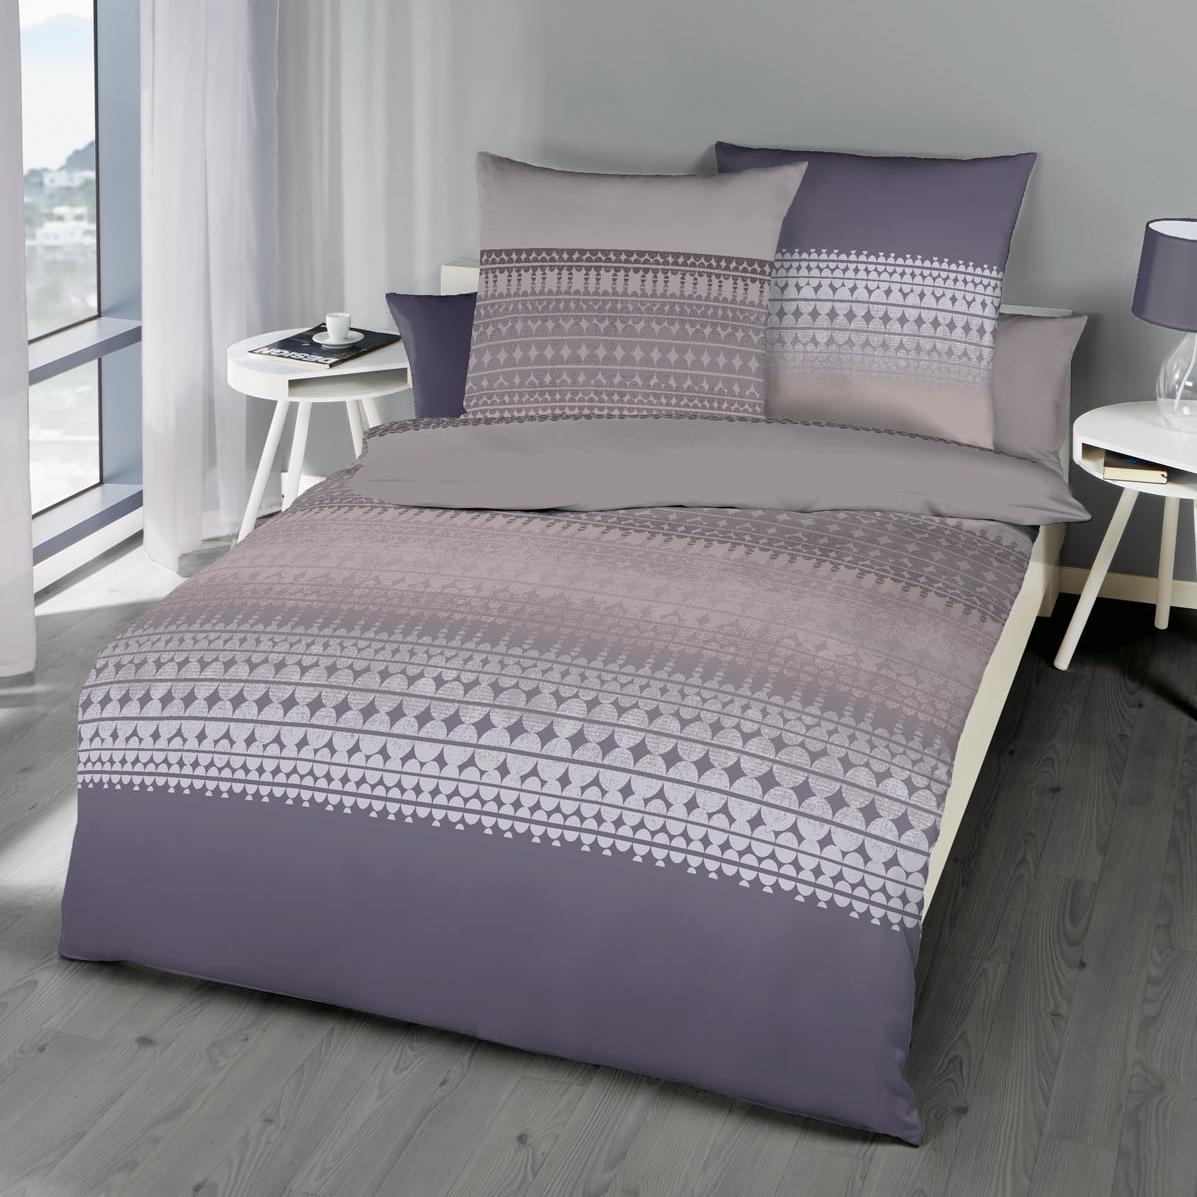 posteljnina kaeppel linon - vijolična